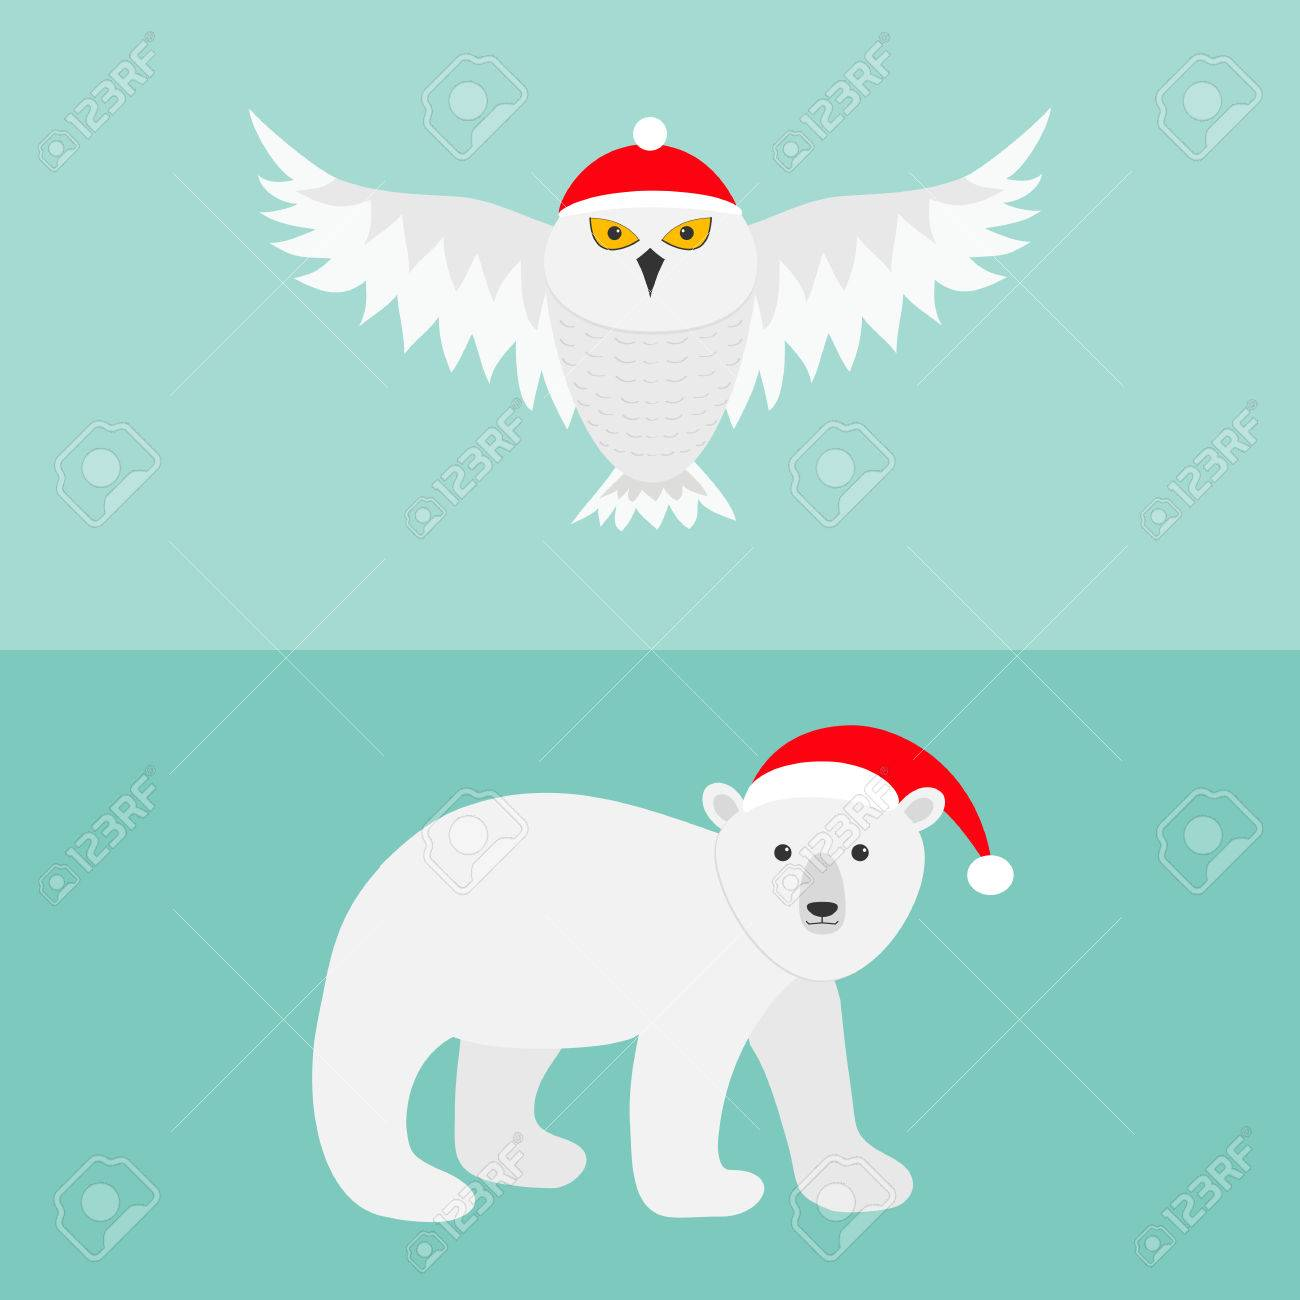 Hibou Blanc Milou Ours Polaire Red Hat Pere Noel Voler Oiseau